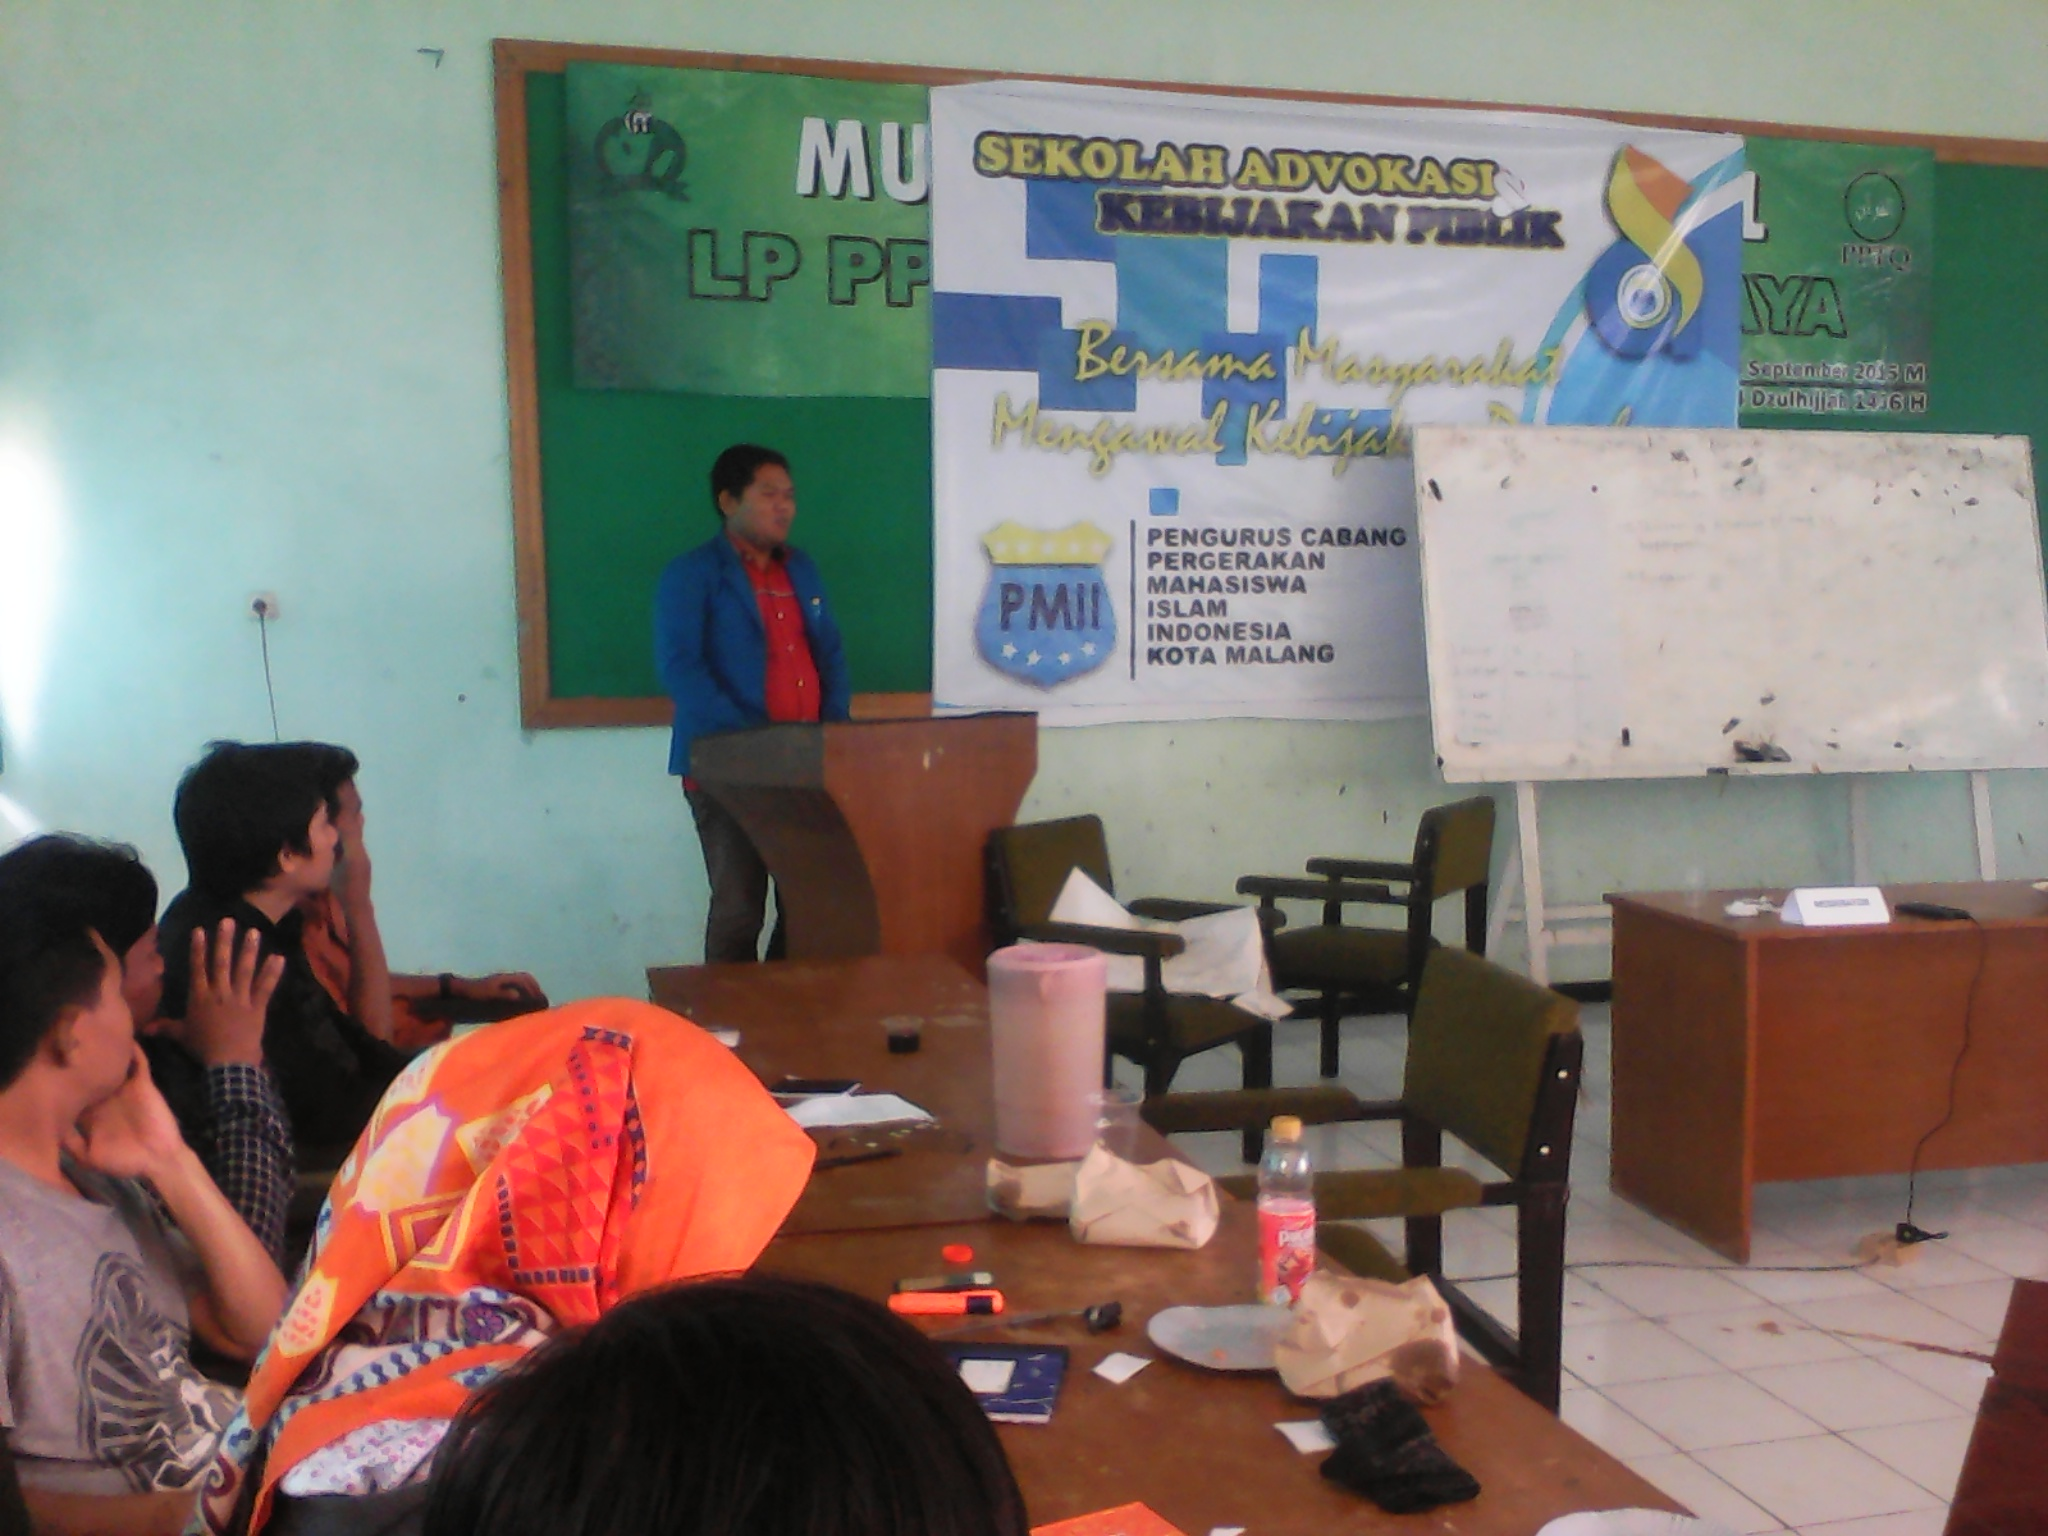 Wakil Ketua II PC PMII Kota Malang, Muhammad Suri saat membuka acara Sekolah Advokasi Kebijakan Publik, 2 Oktober 2015